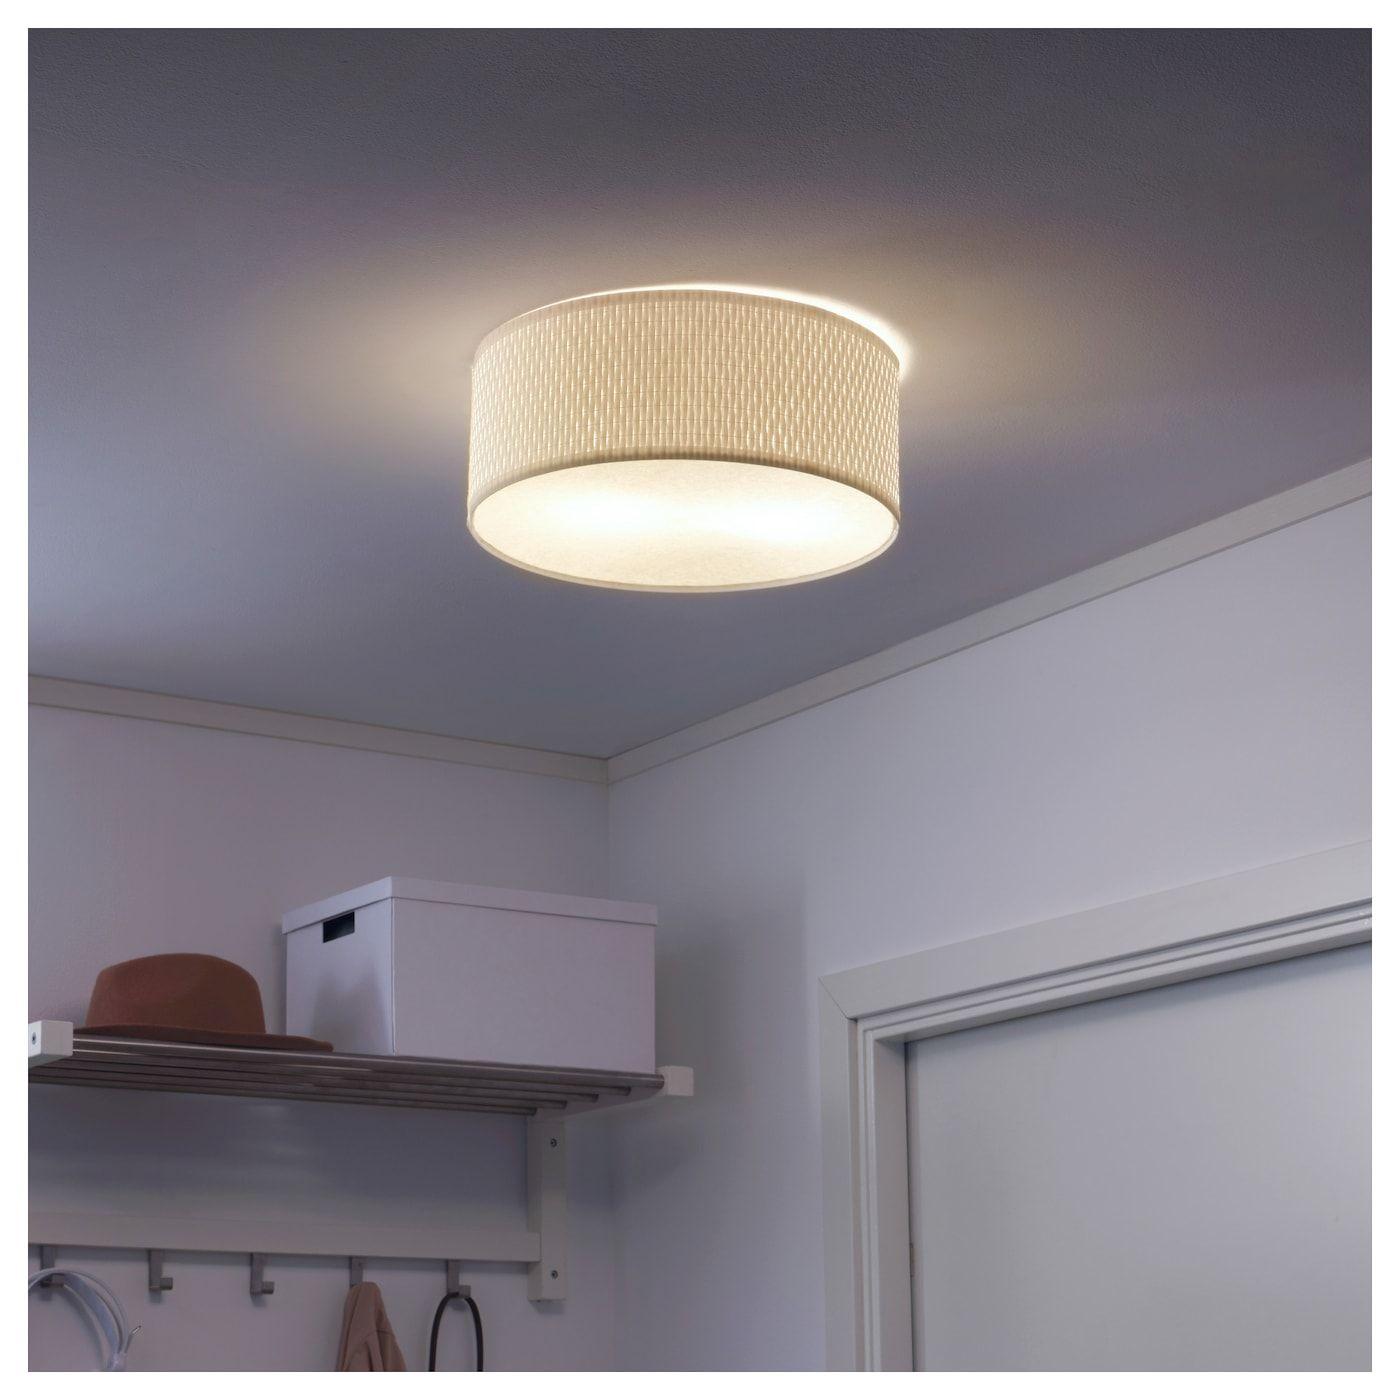 Alang Deckenleuchte Weiss Ikea Deutschland Ceiling Lamp White Ceiling Lamp Bedroom Ceiling Light